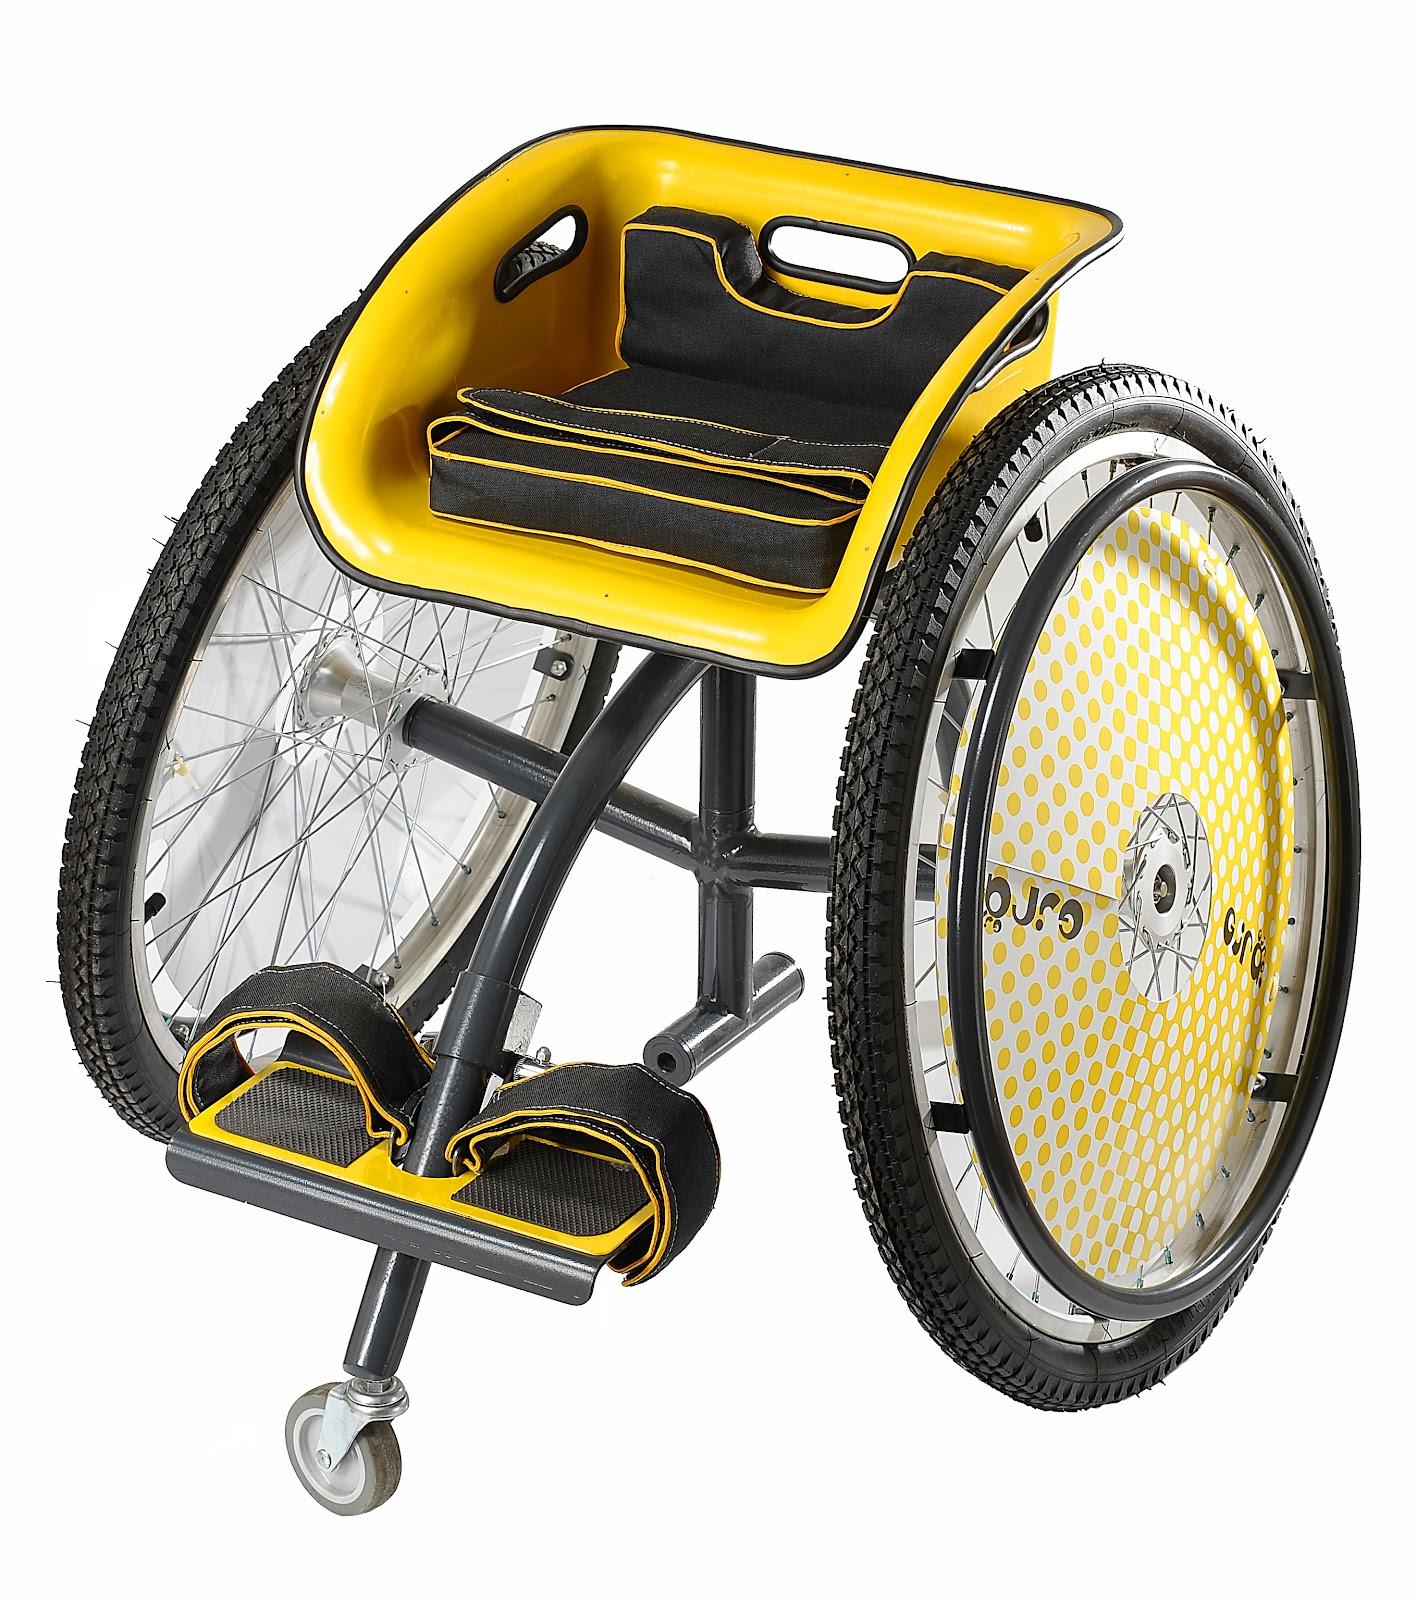 Catedra rondina dise o industrial fadu uba silla de ruedas deportiva - Minos sillas de ruedas ...